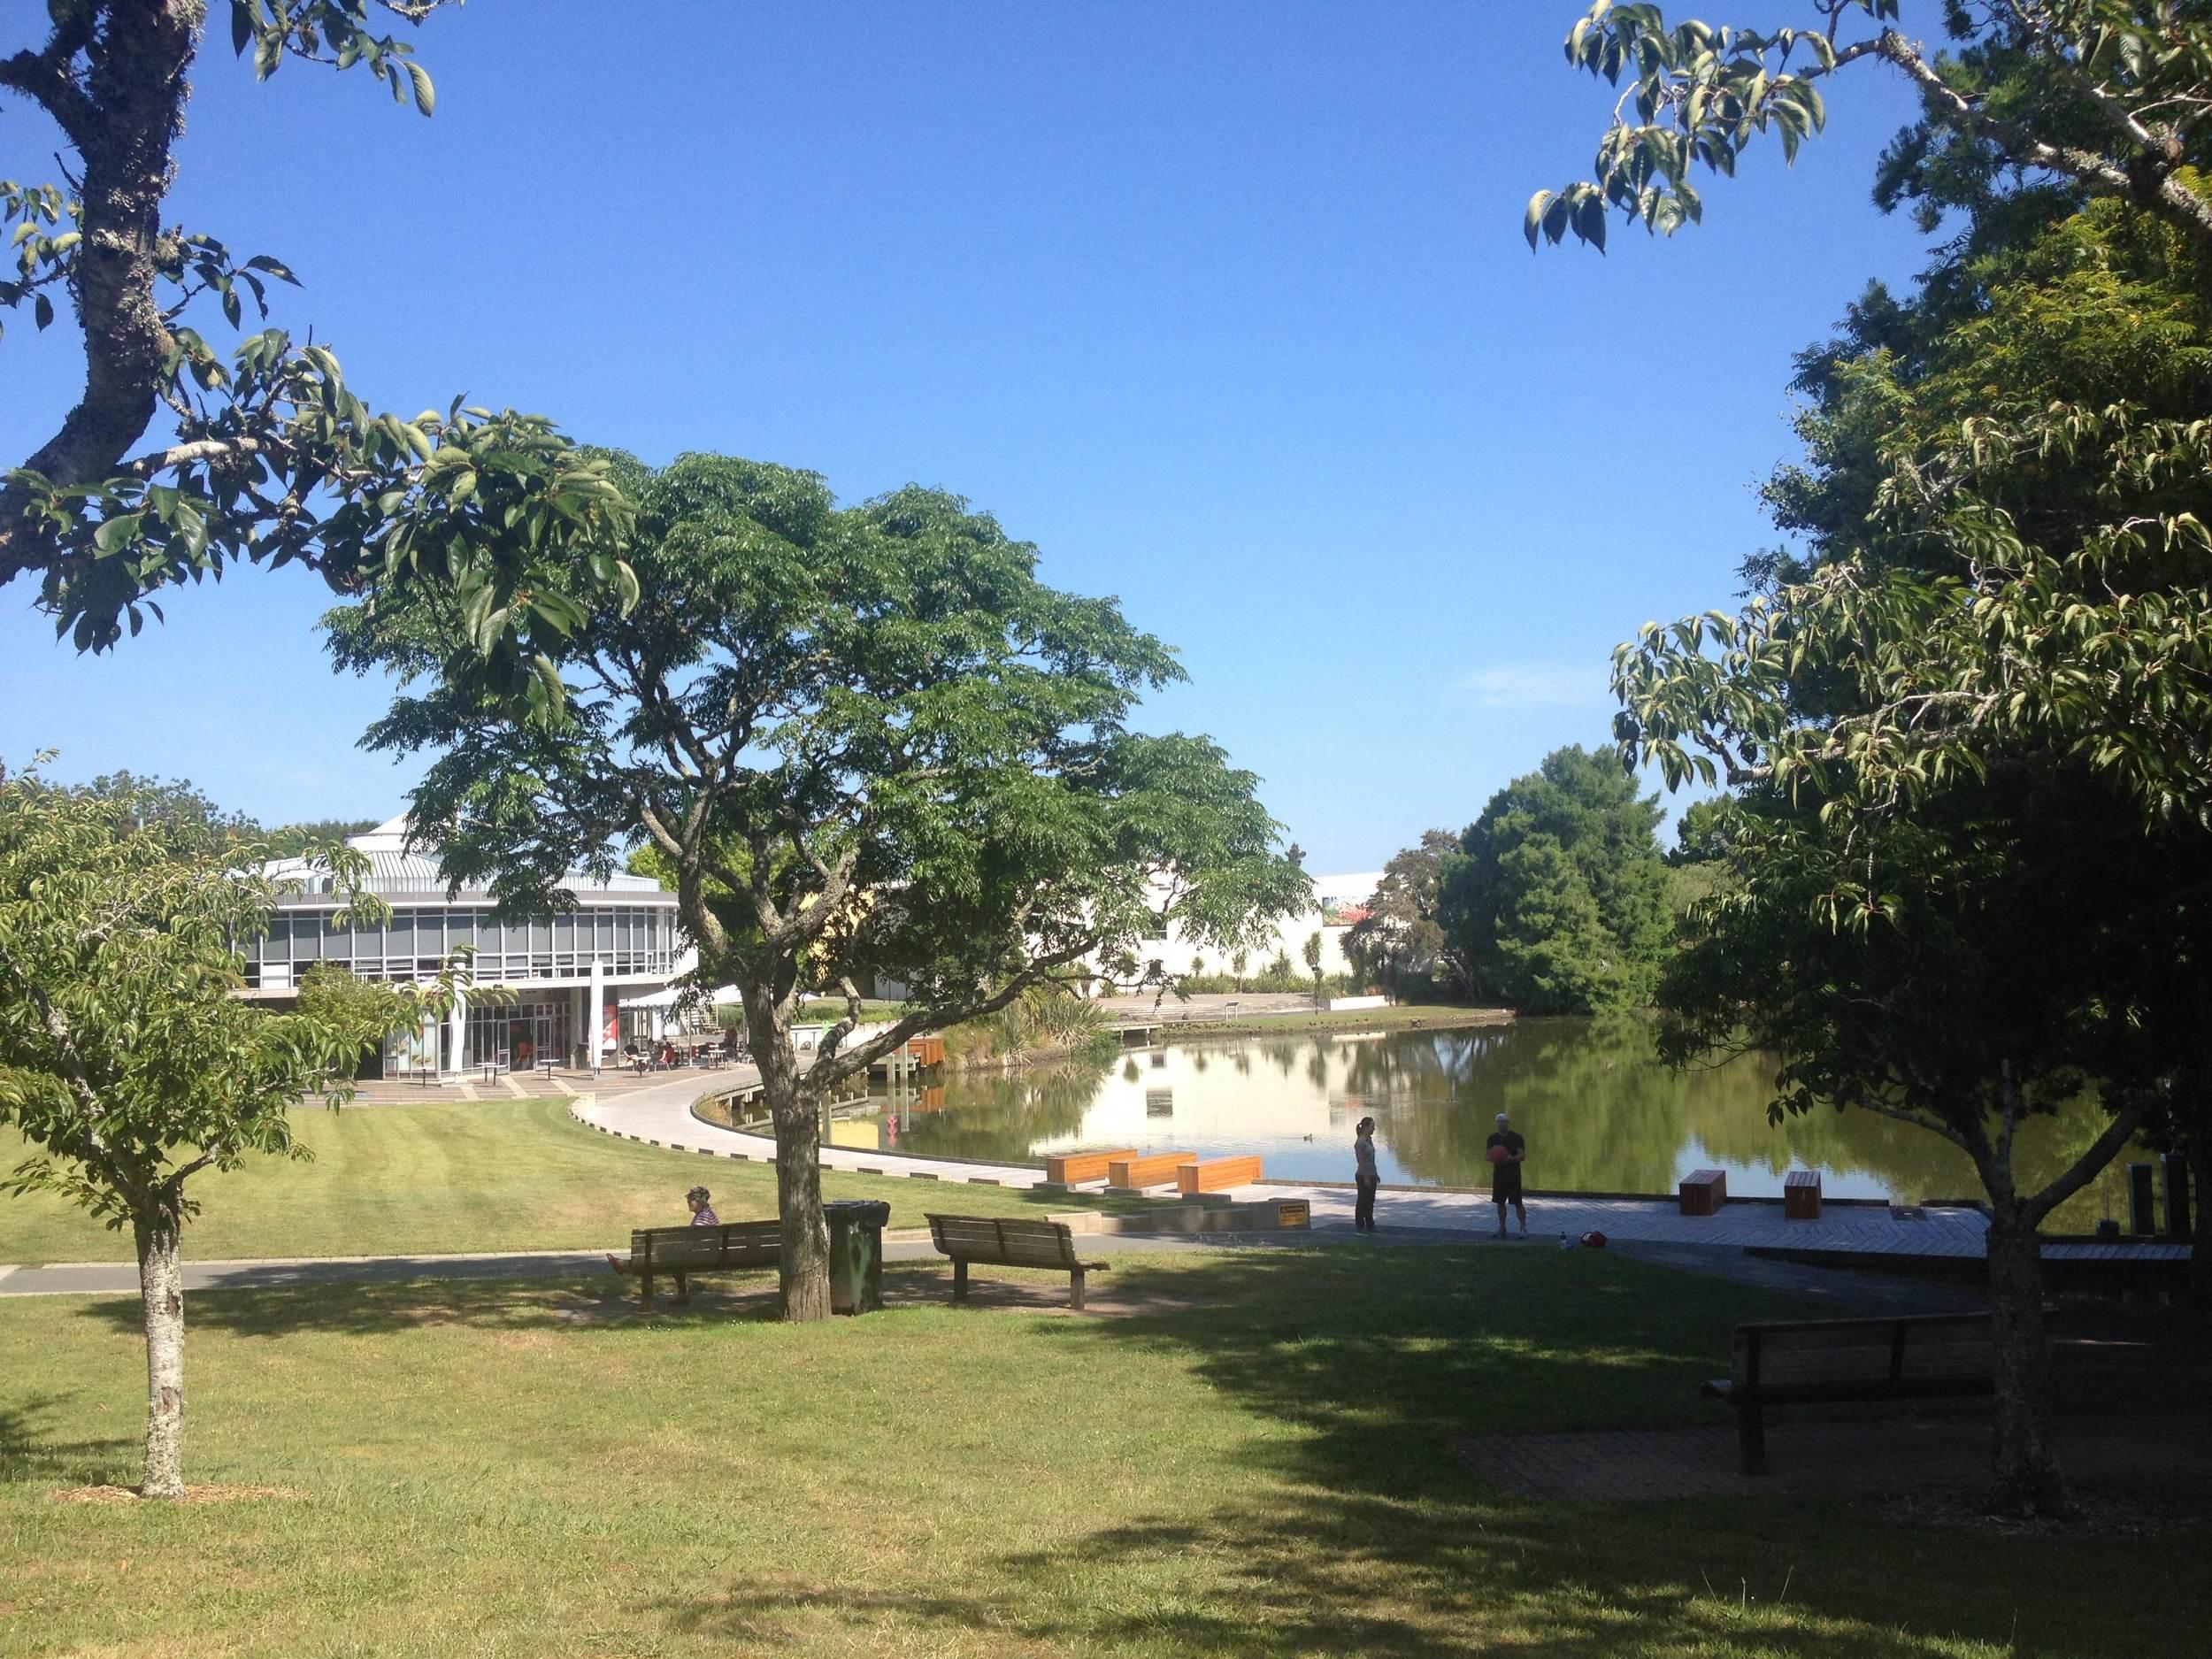 University of Waikato, New Zealand.